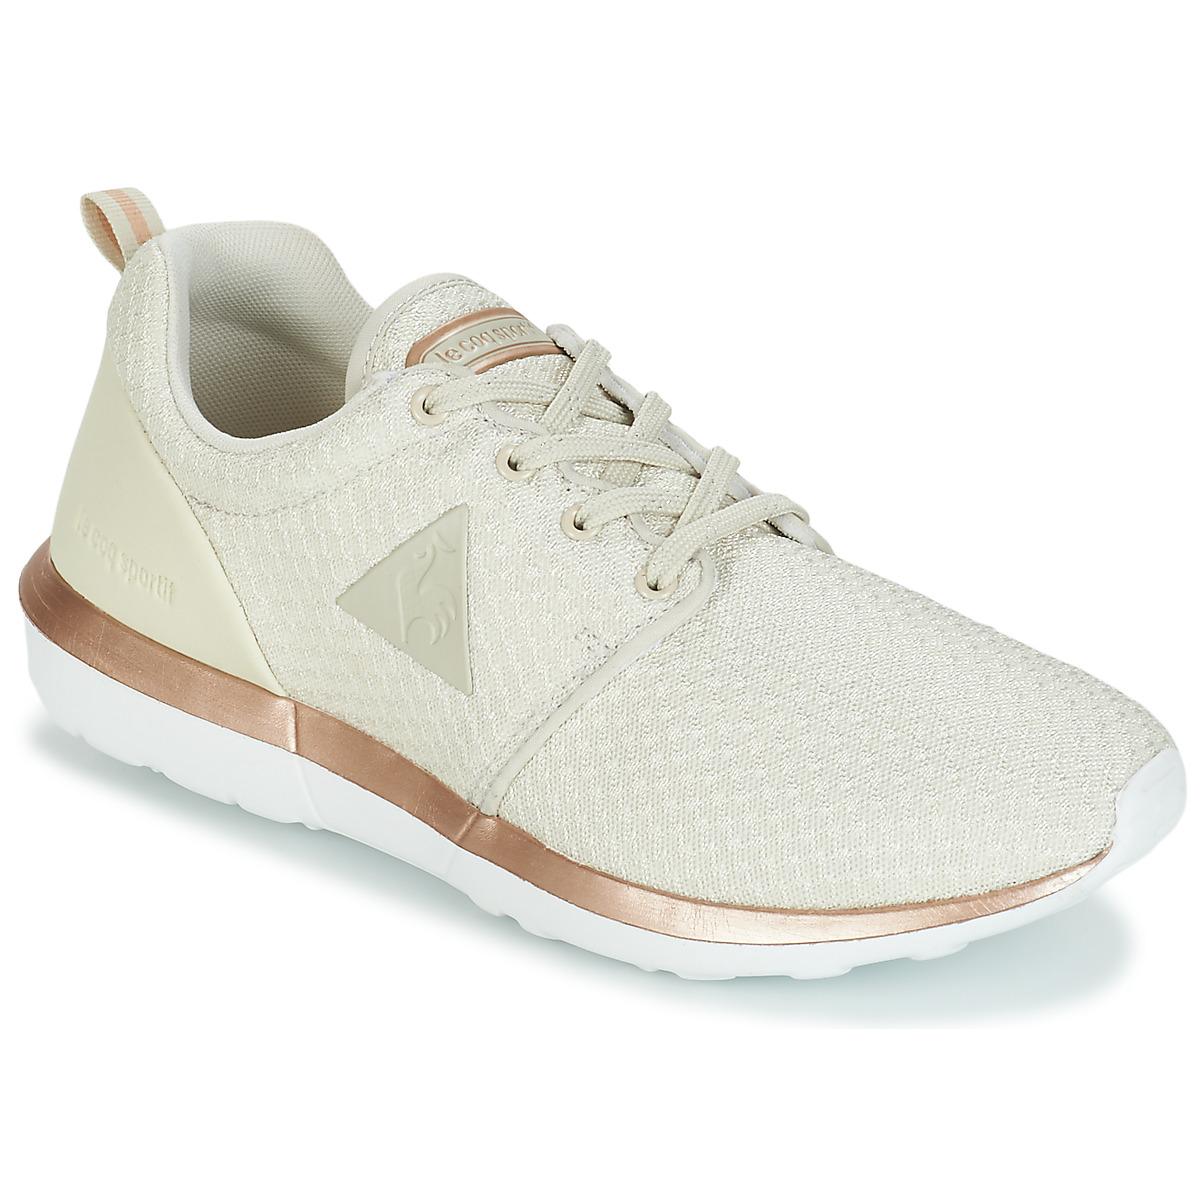 Sneakers Scarpe donna Le Coq Sportif  DYNACOMF W SPORT